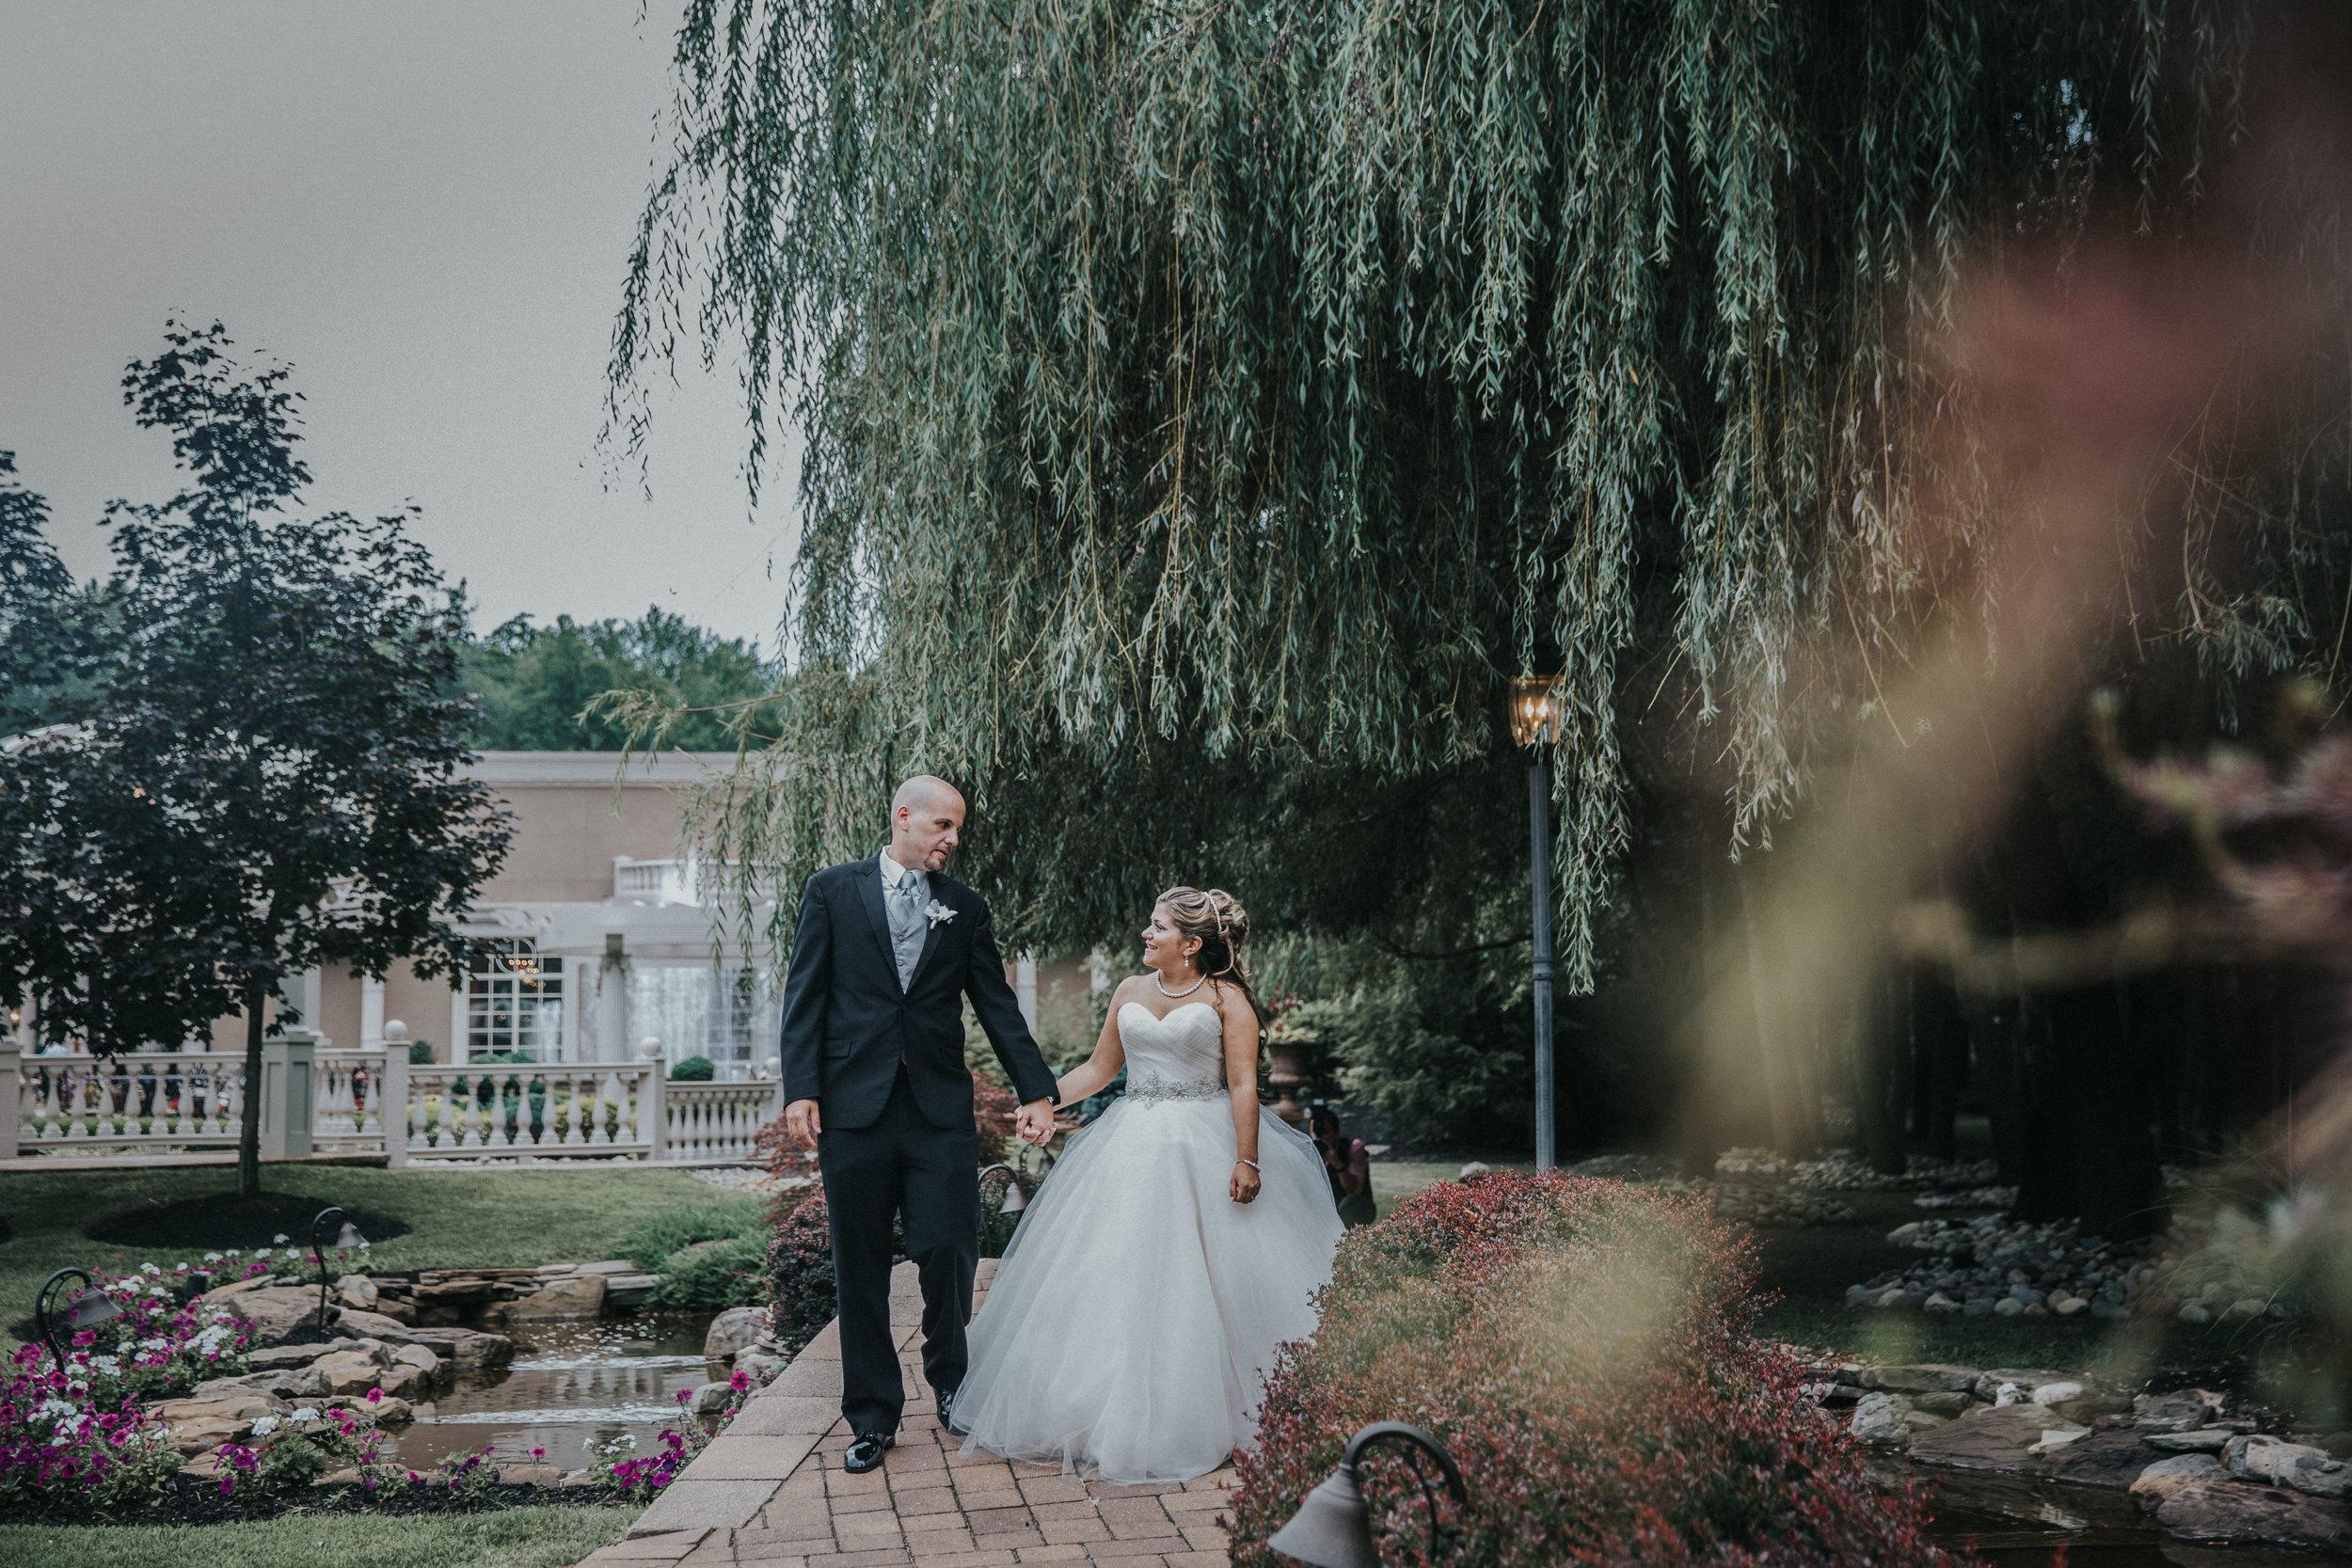 NewJersey_Wedding_Photography_Brigalias_Bride&Groom_Tara&Pete-69.jpg